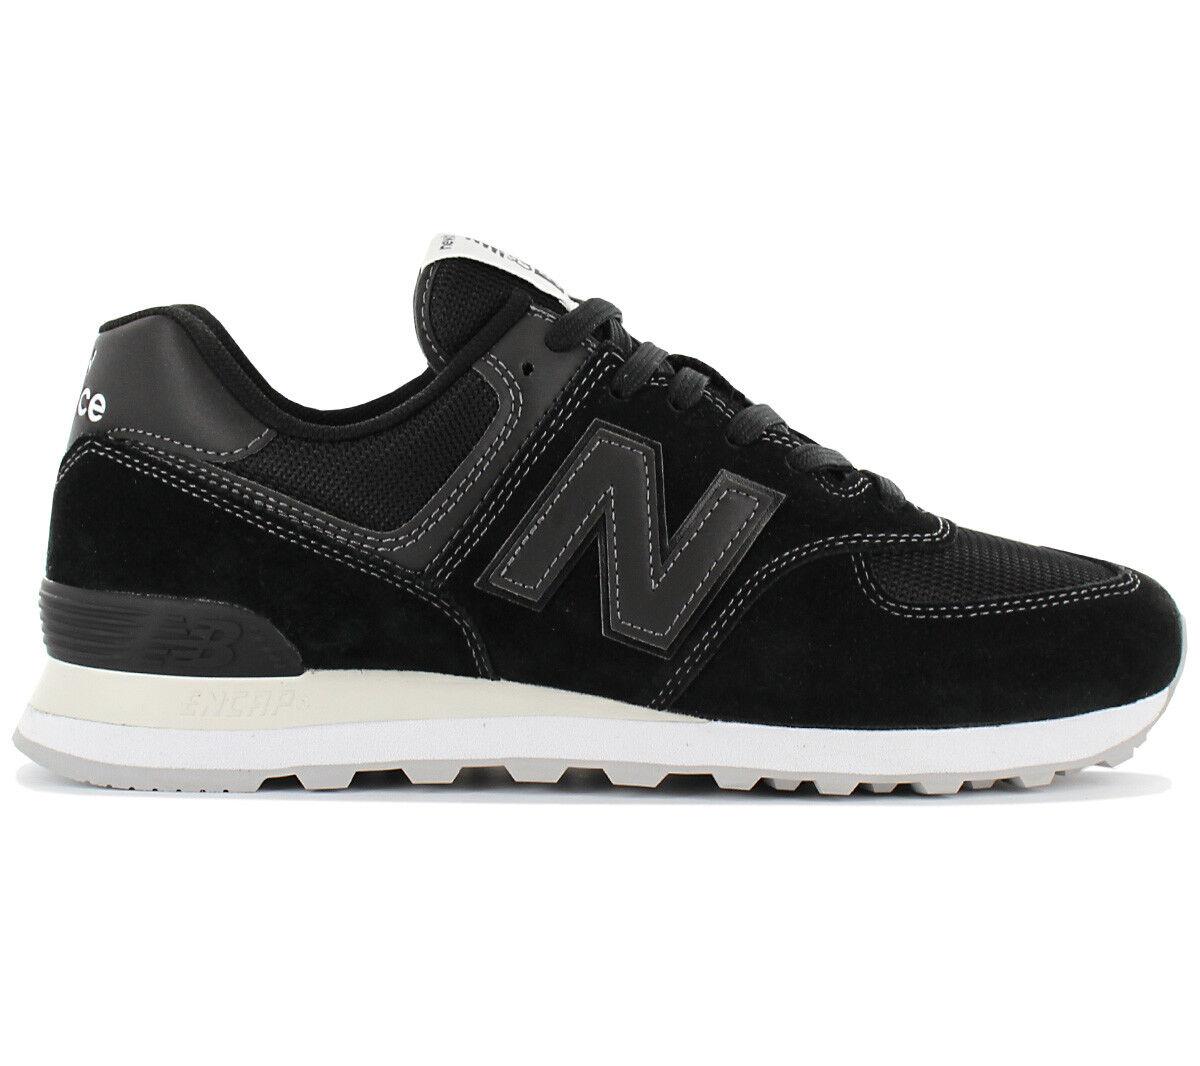 New Balance Classics Zapatillas 2018 Hombre Sneaker ML574ETA Zapatillas Classics de Deporte Negras 773764